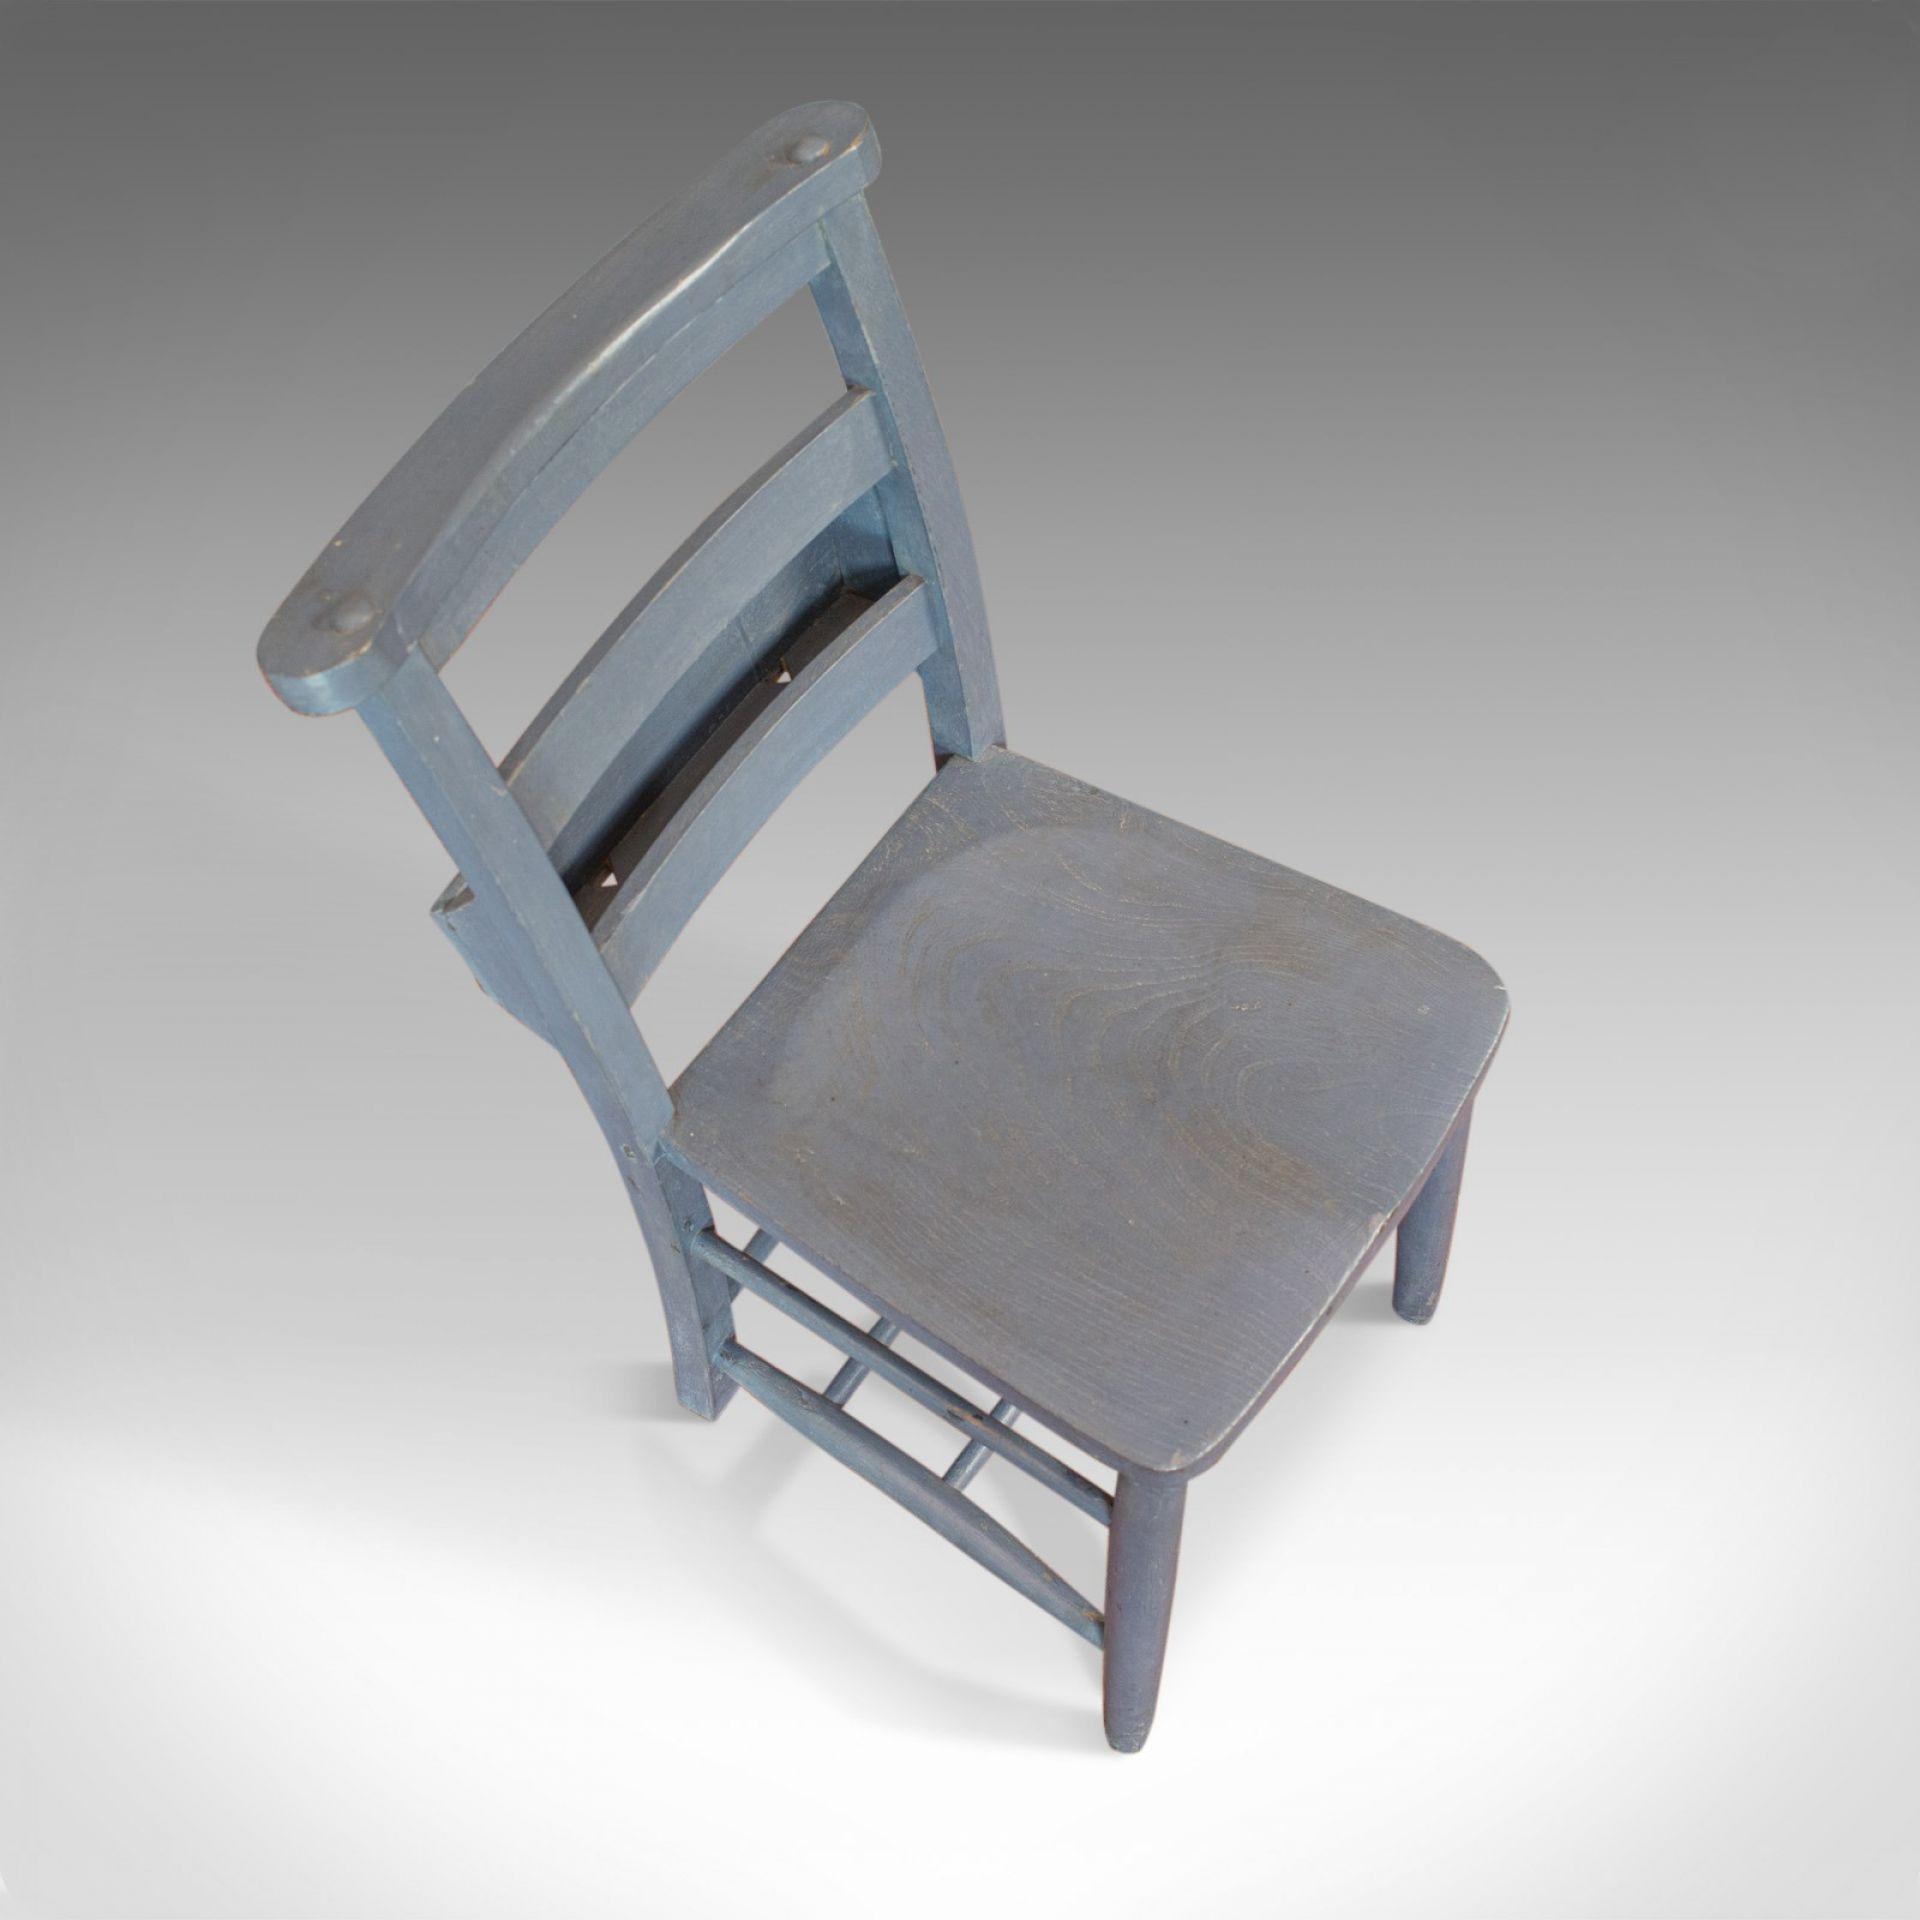 Antique School Chair, English, Victorian, Beech, Educational, Seat, Circa 1900